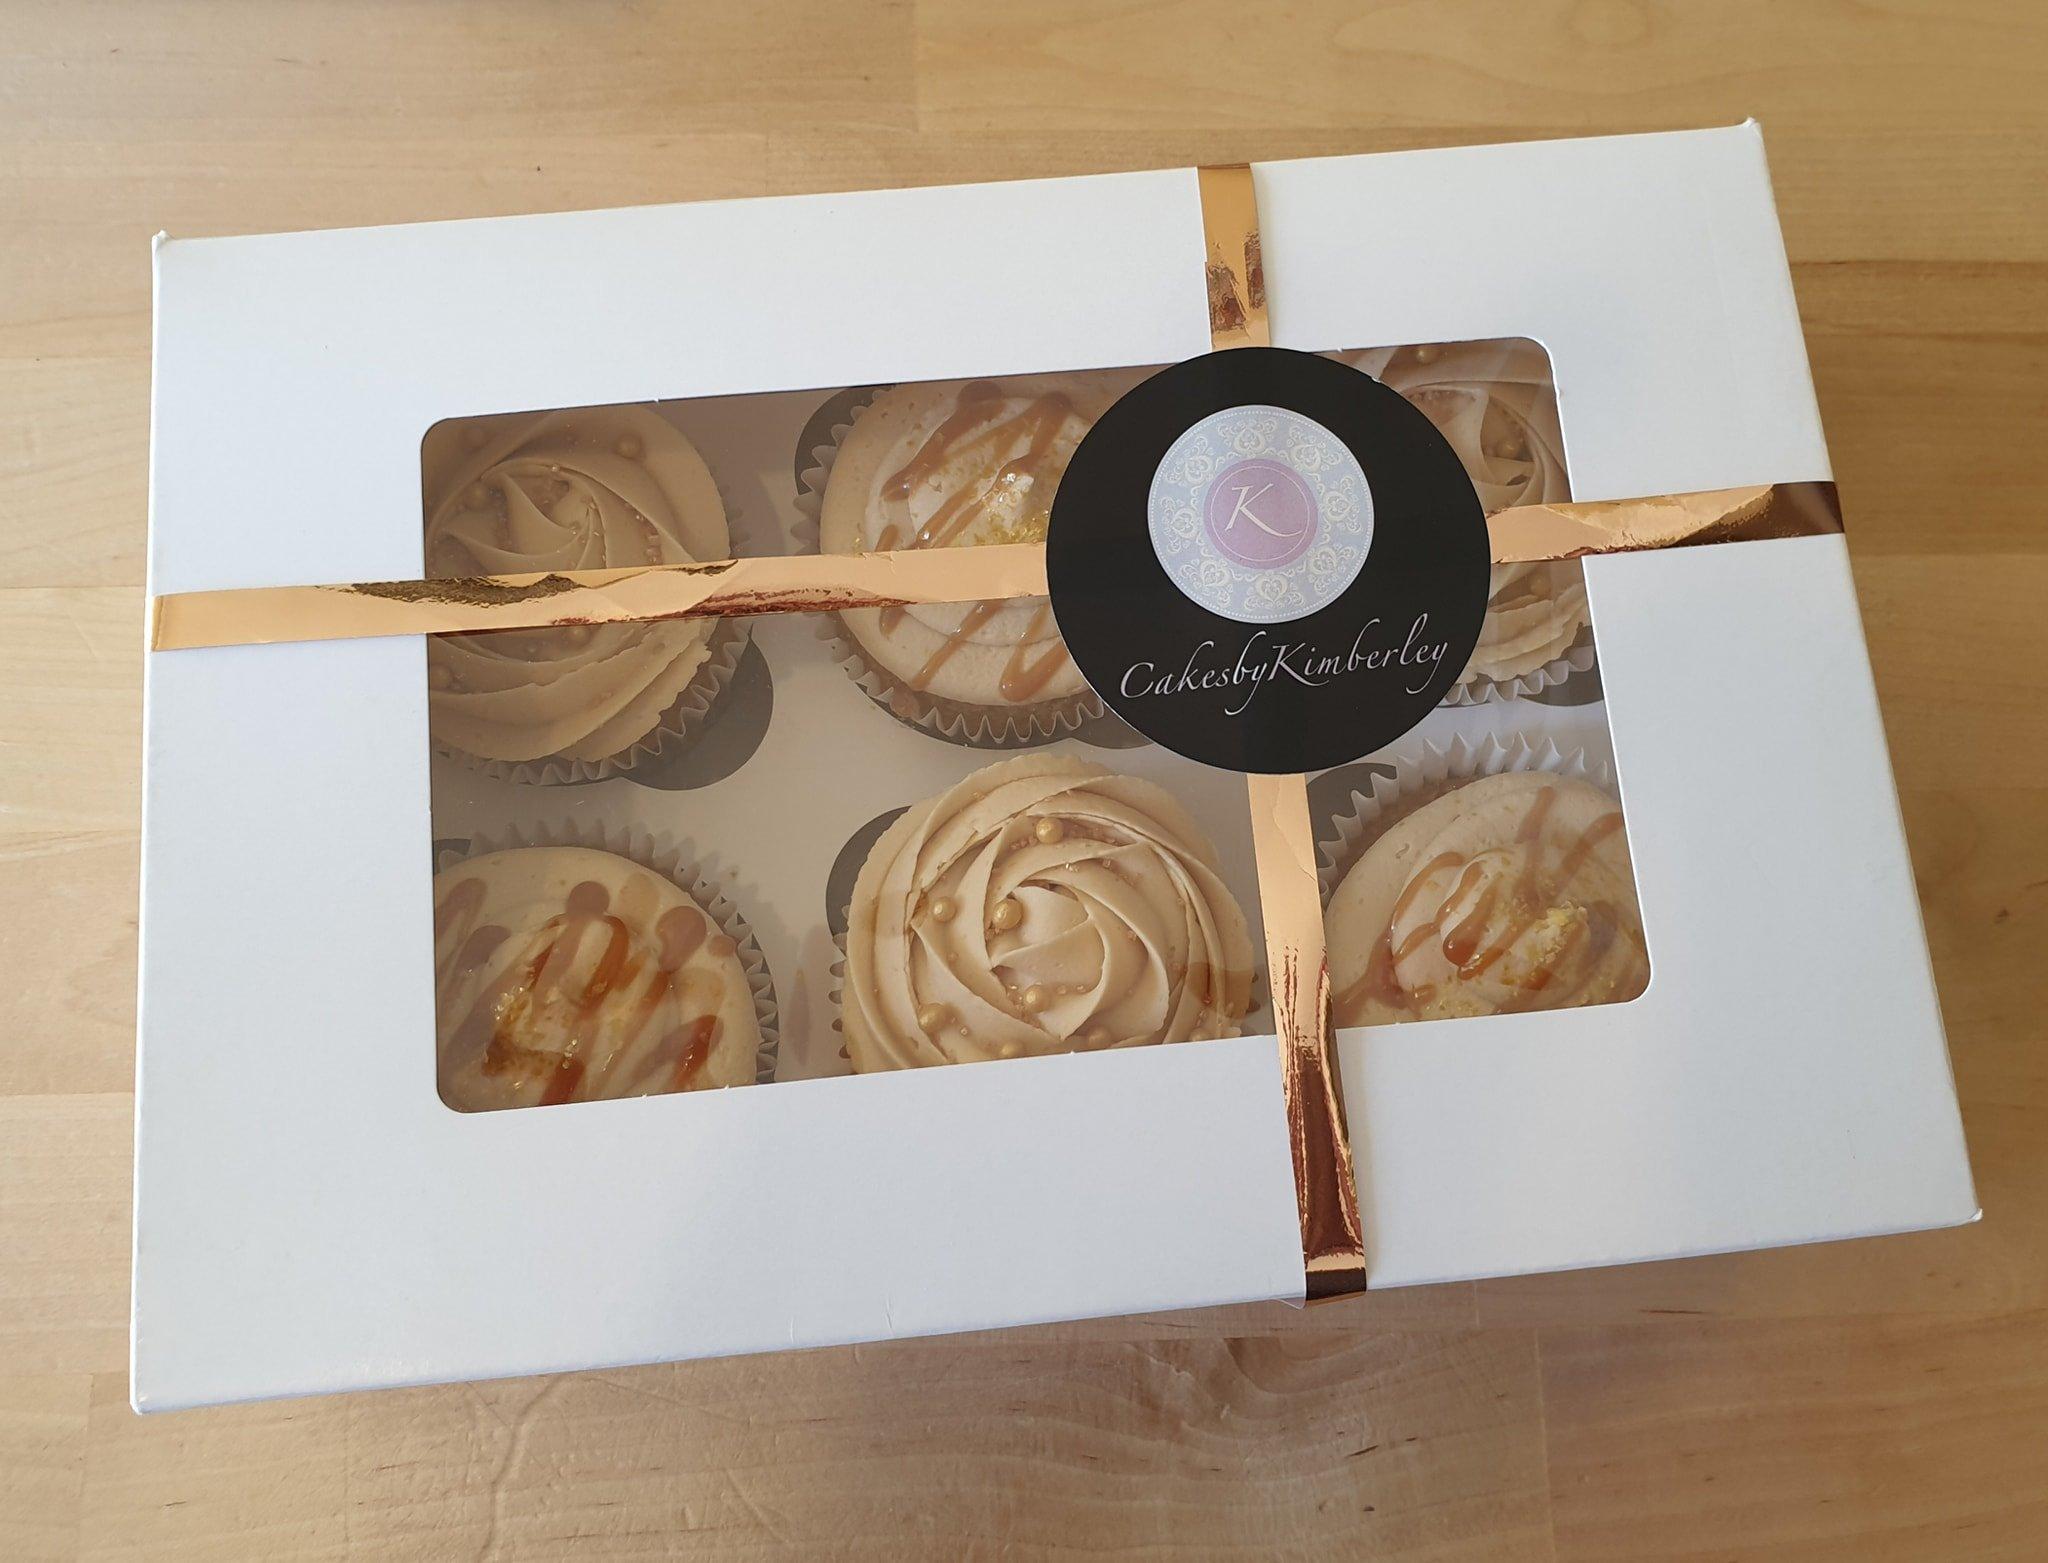 Cupcakes - gift box